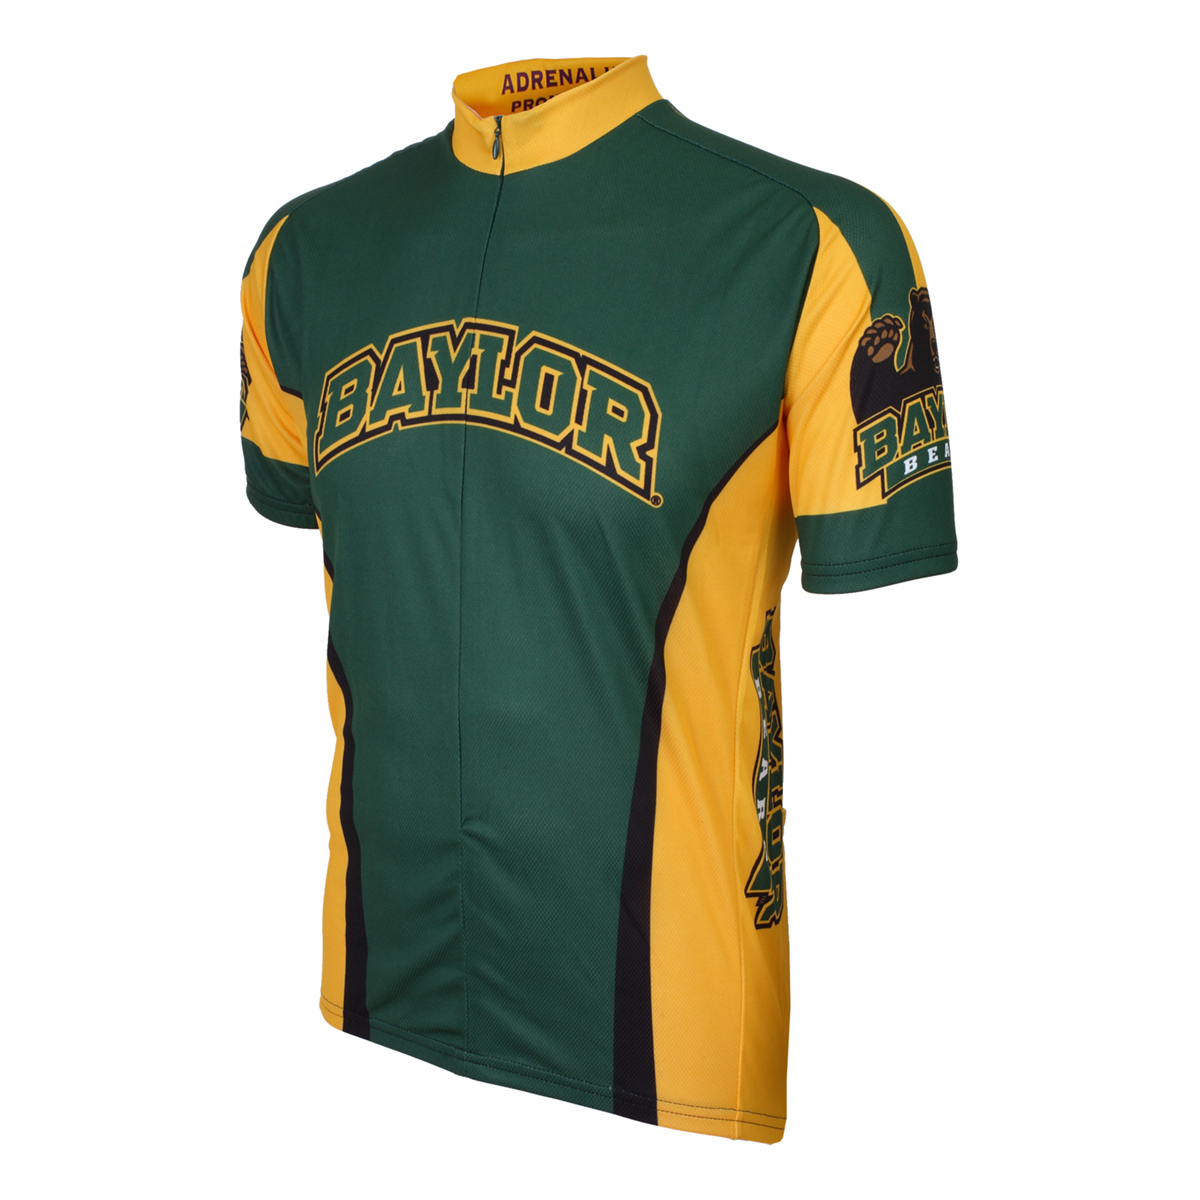 Image of Adrenaline Promotions Baylor University Bears Cycling Jersey